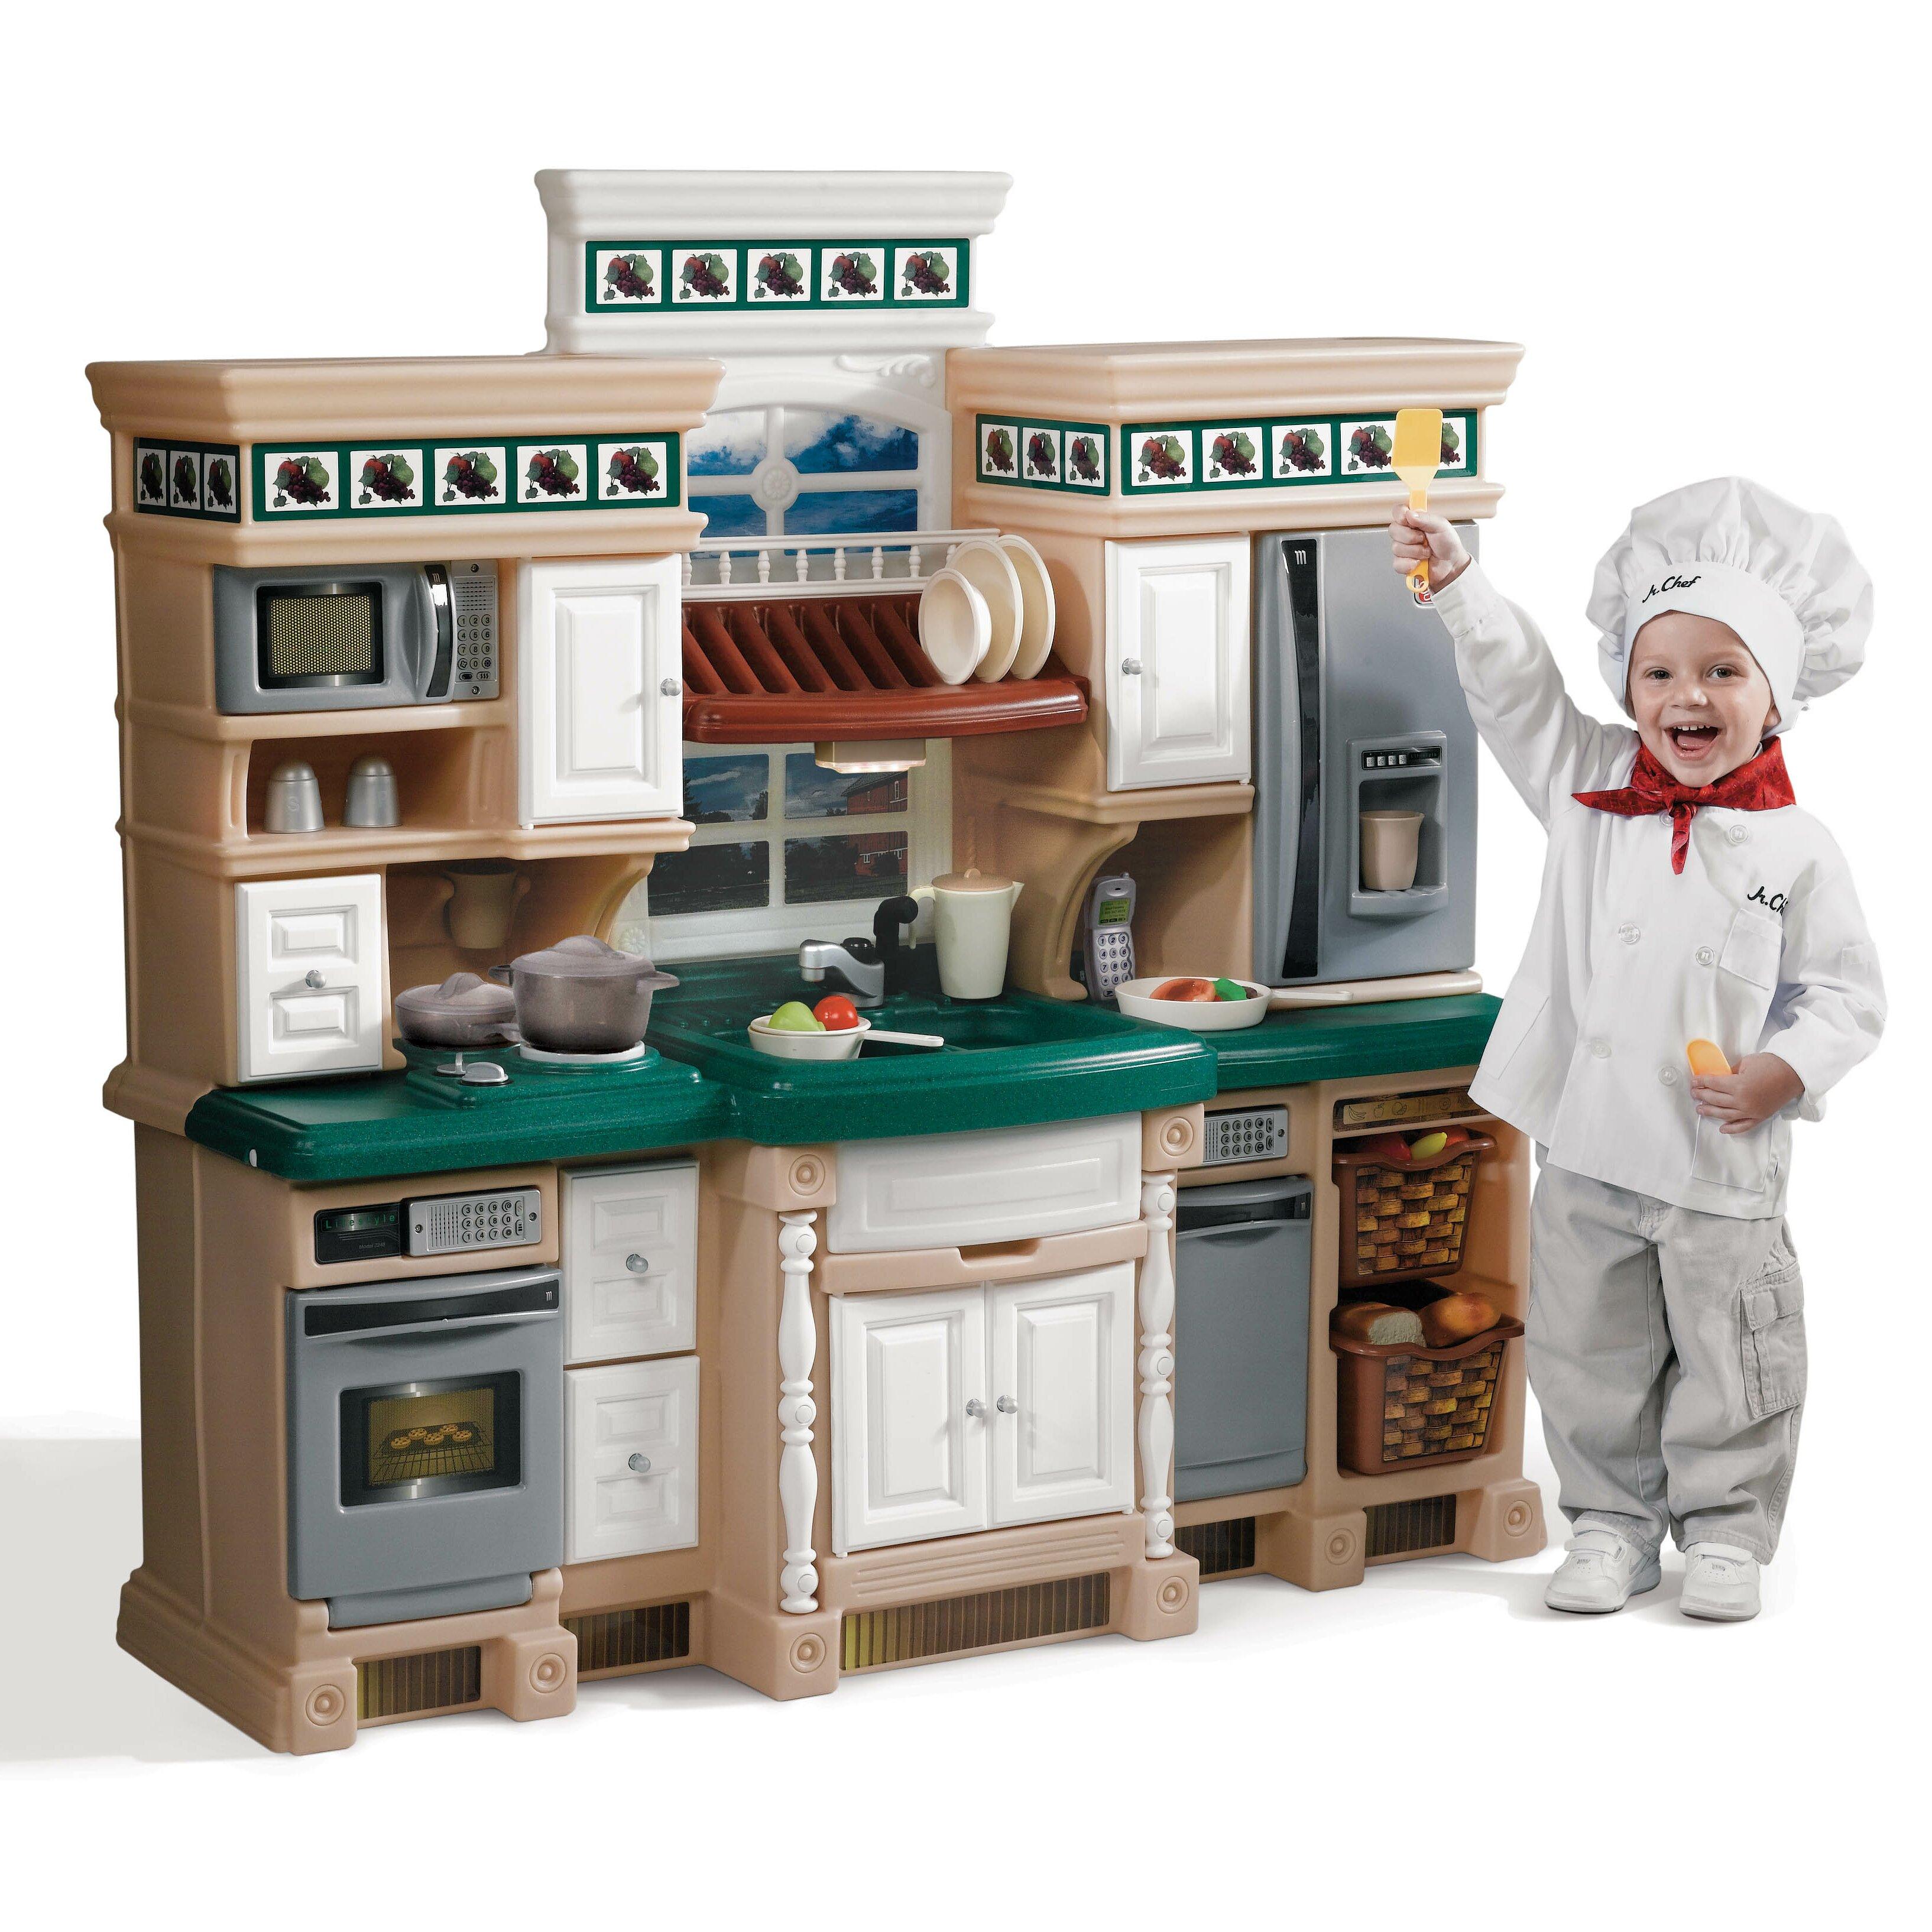 Step2 LifeStyle Deluxe Kitchen Set & Reviews | Wayfair